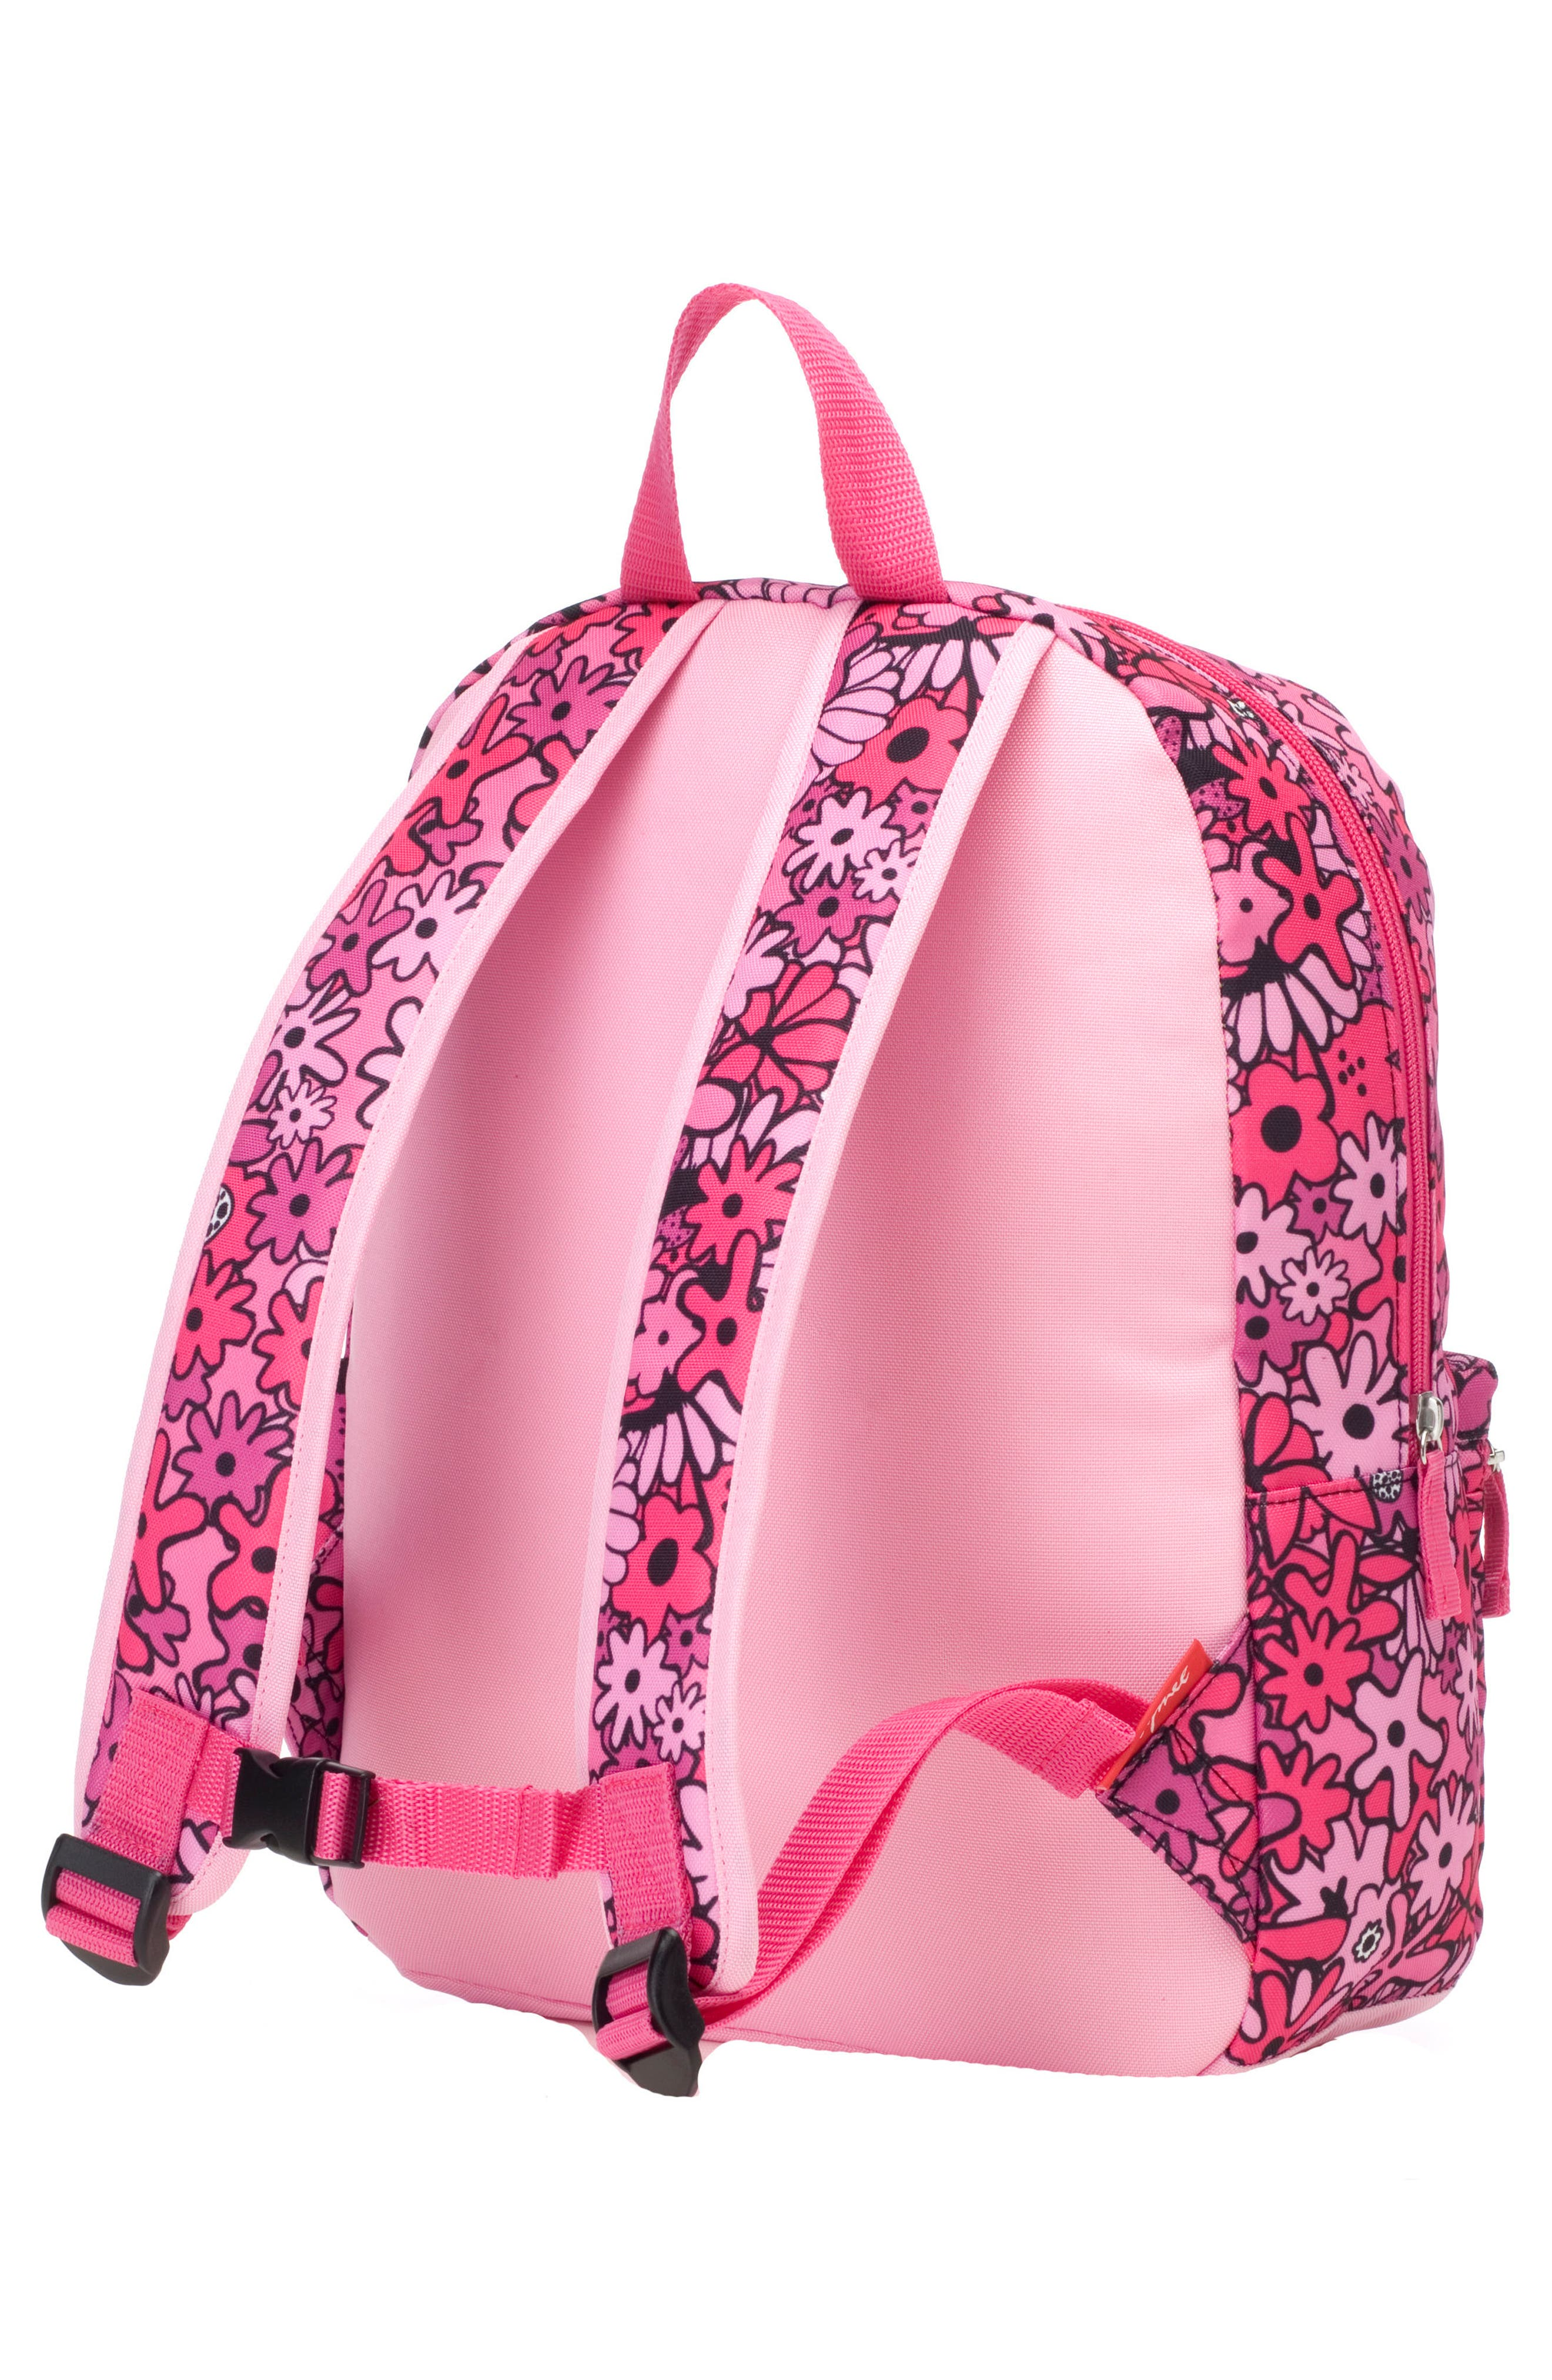 Zip & Zoe Floral Junior Backpack,                             Alternate thumbnail 5, color,                             Floral Pink